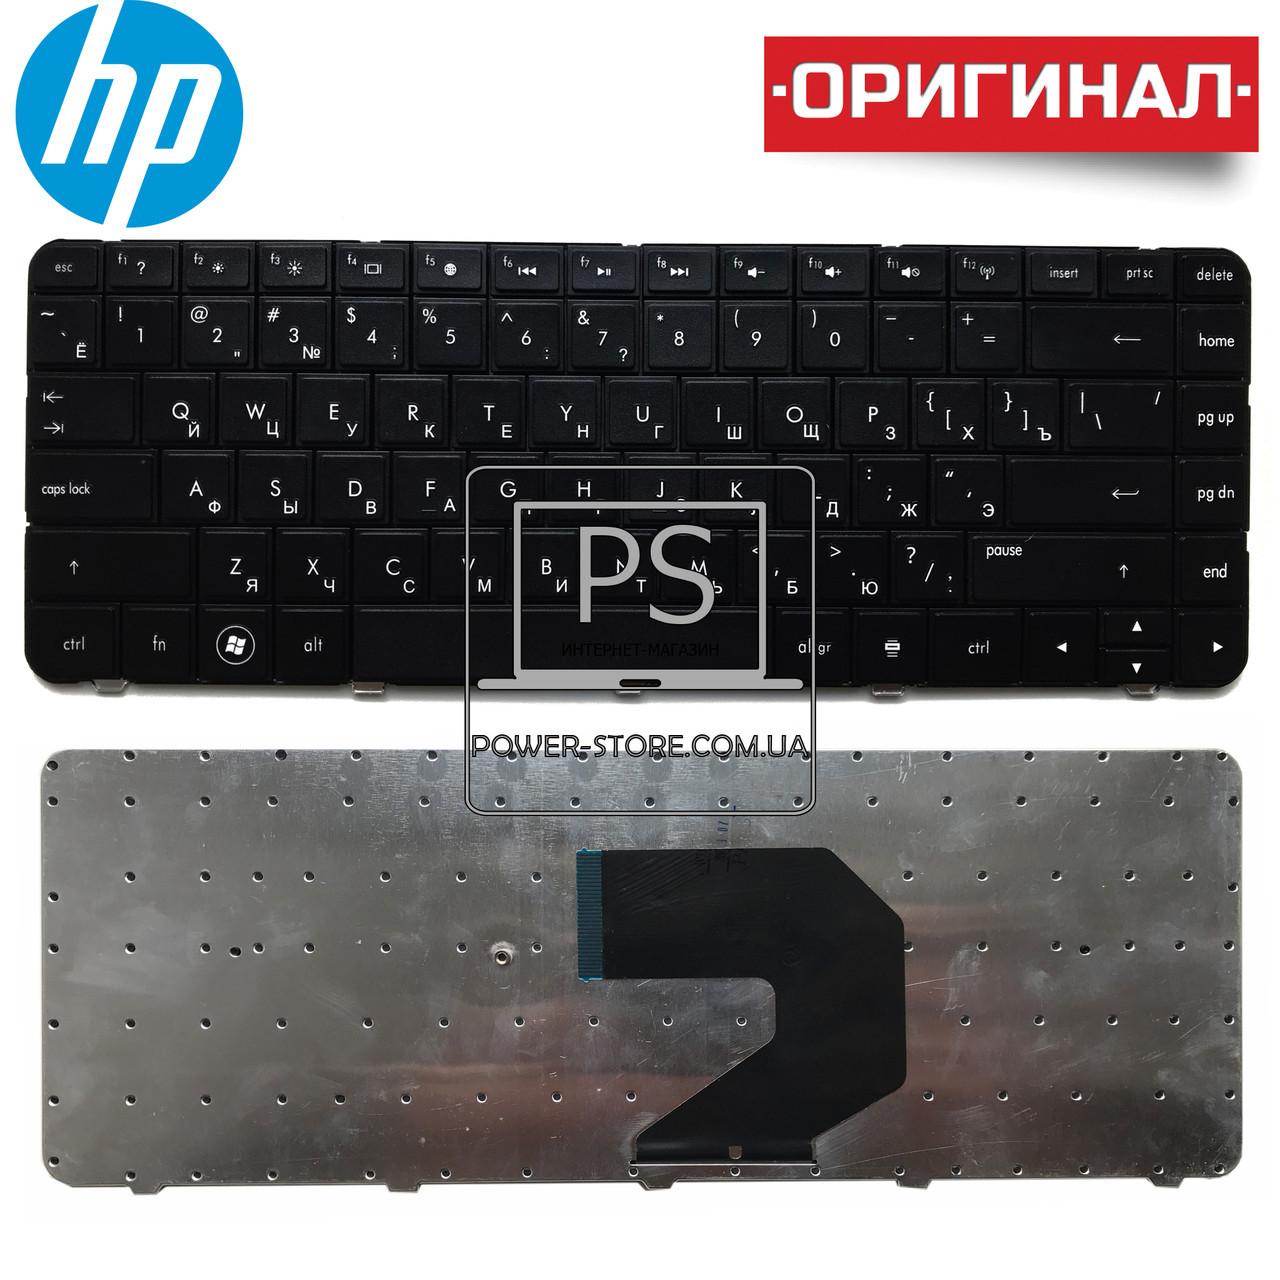 Клавиатура для ноутбука HP 697529-041, 697529-051, 697529-061, 697529-071, 697529-111, 697529-121